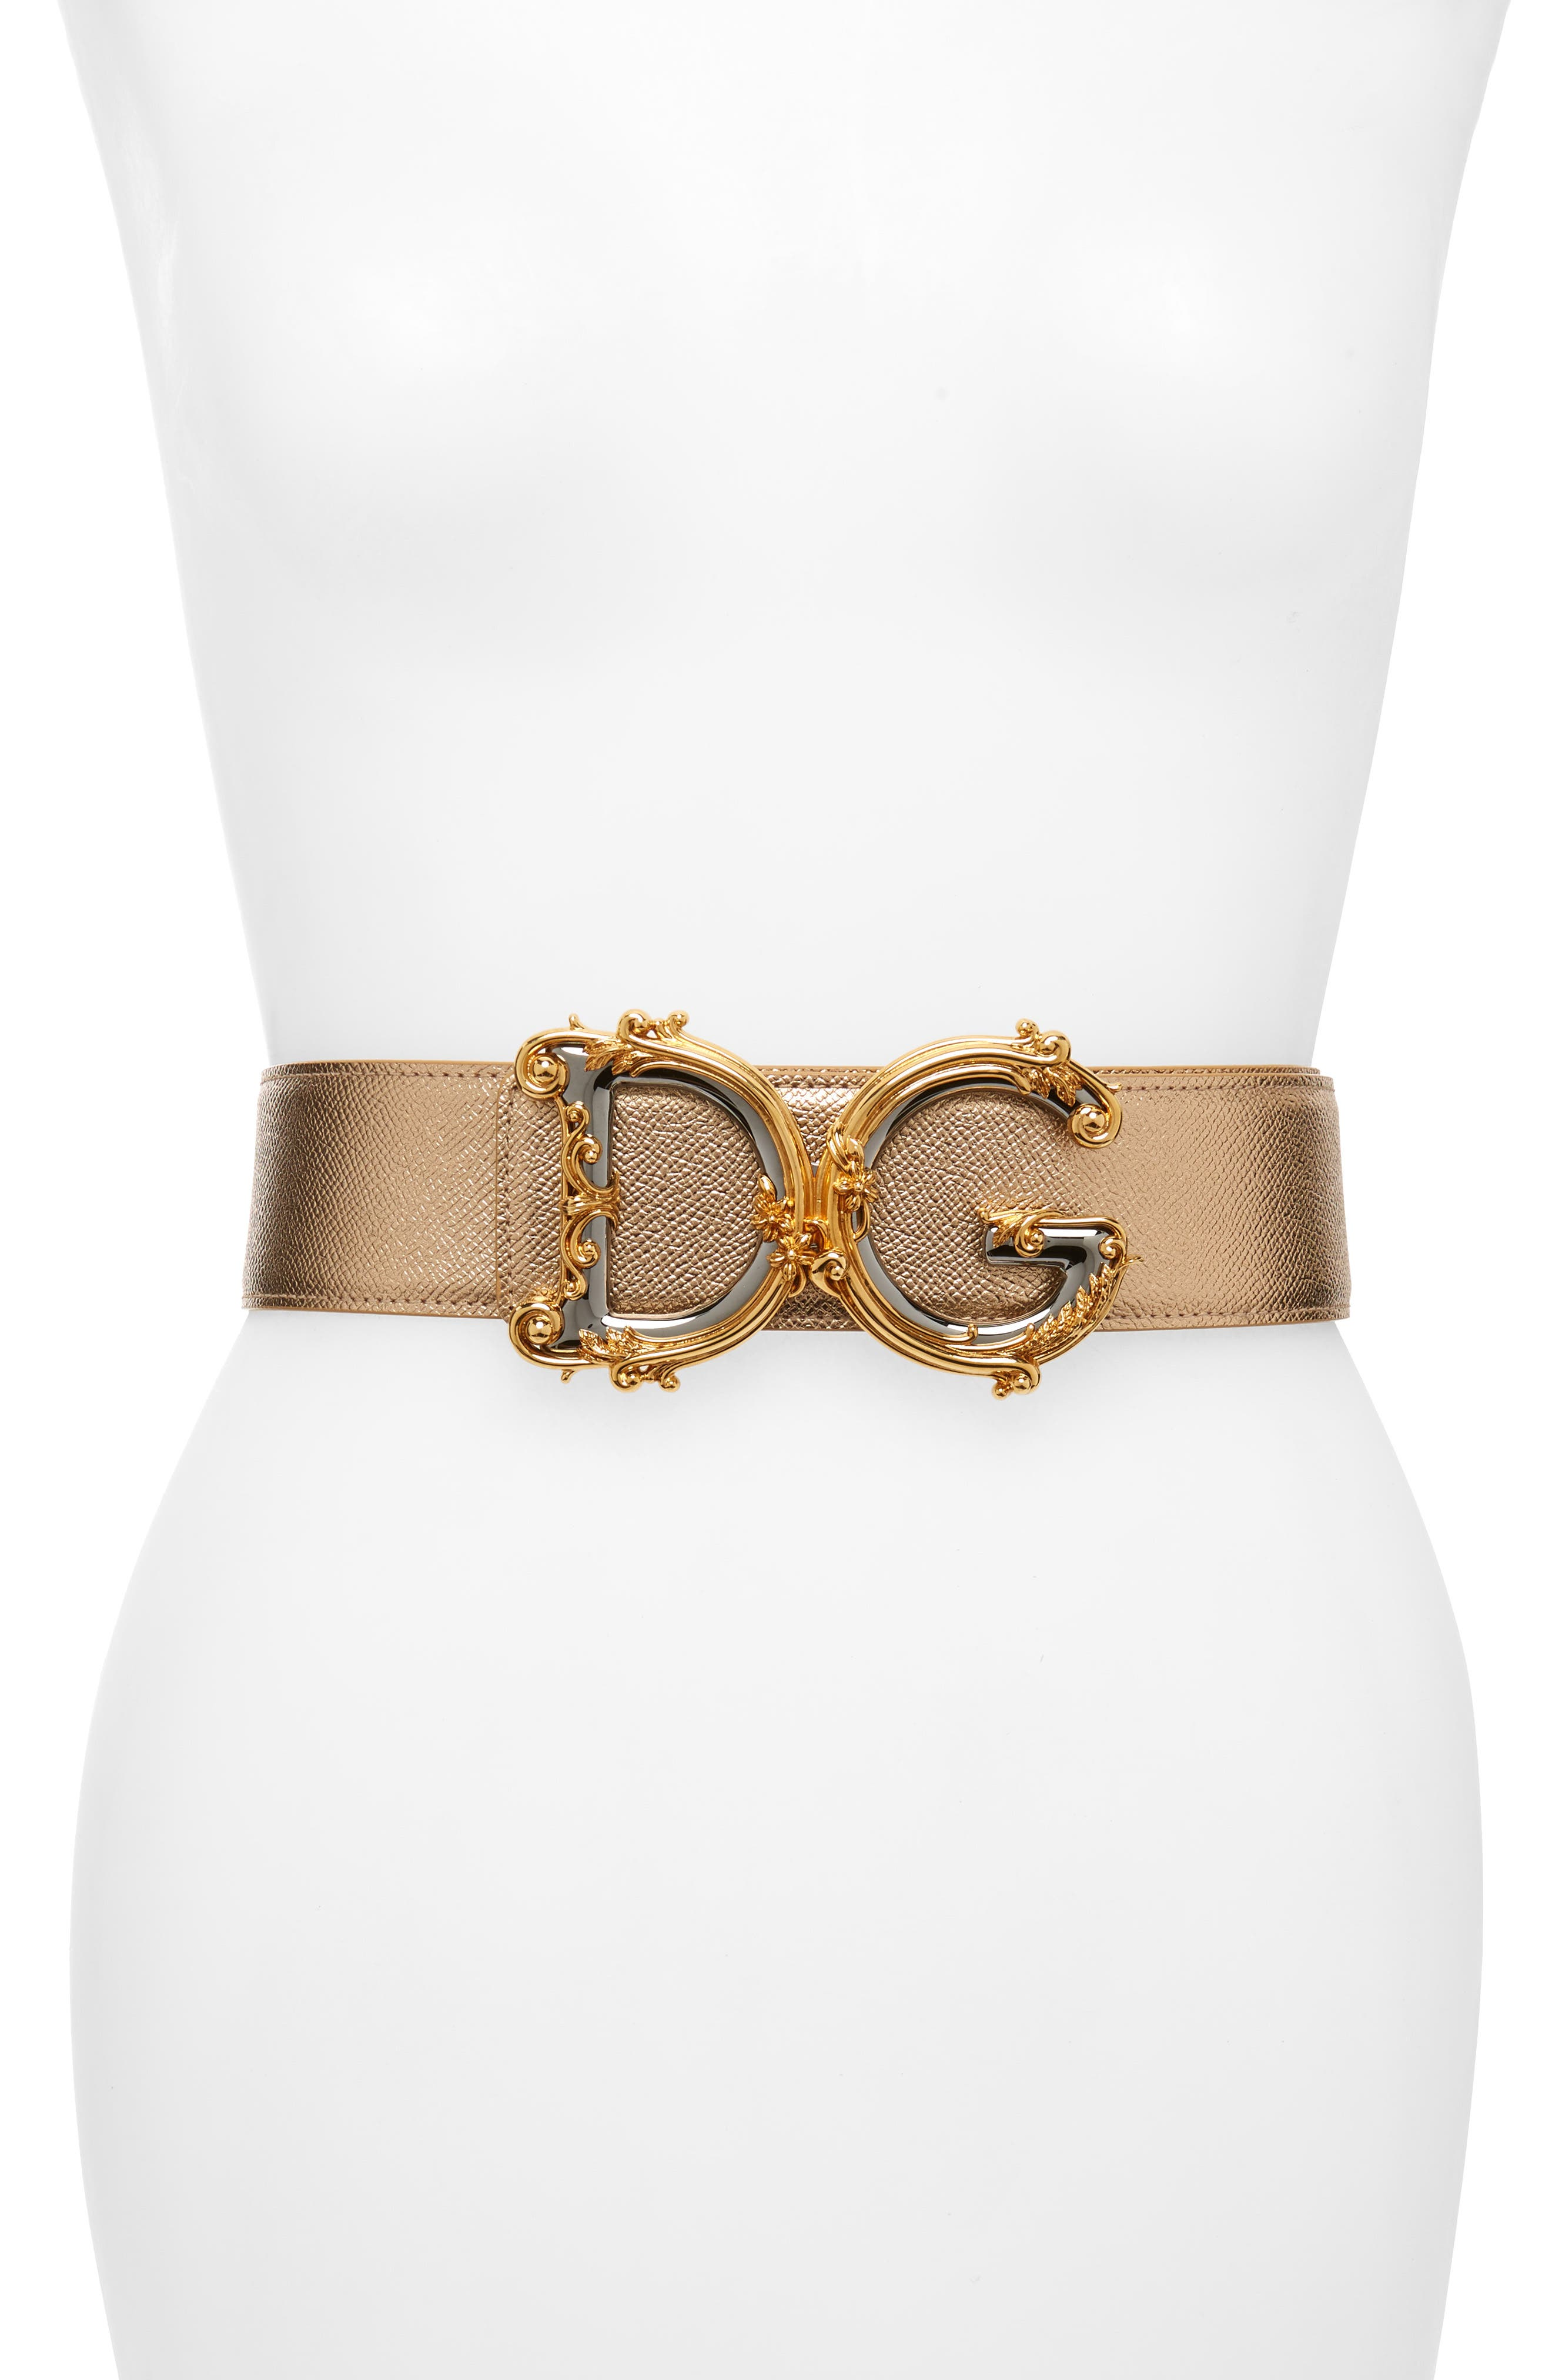 DOLCE&GABBANA,                             DG Baroque Metallic Calfskin Leather Belt,                             Main thumbnail 1, color,                             719